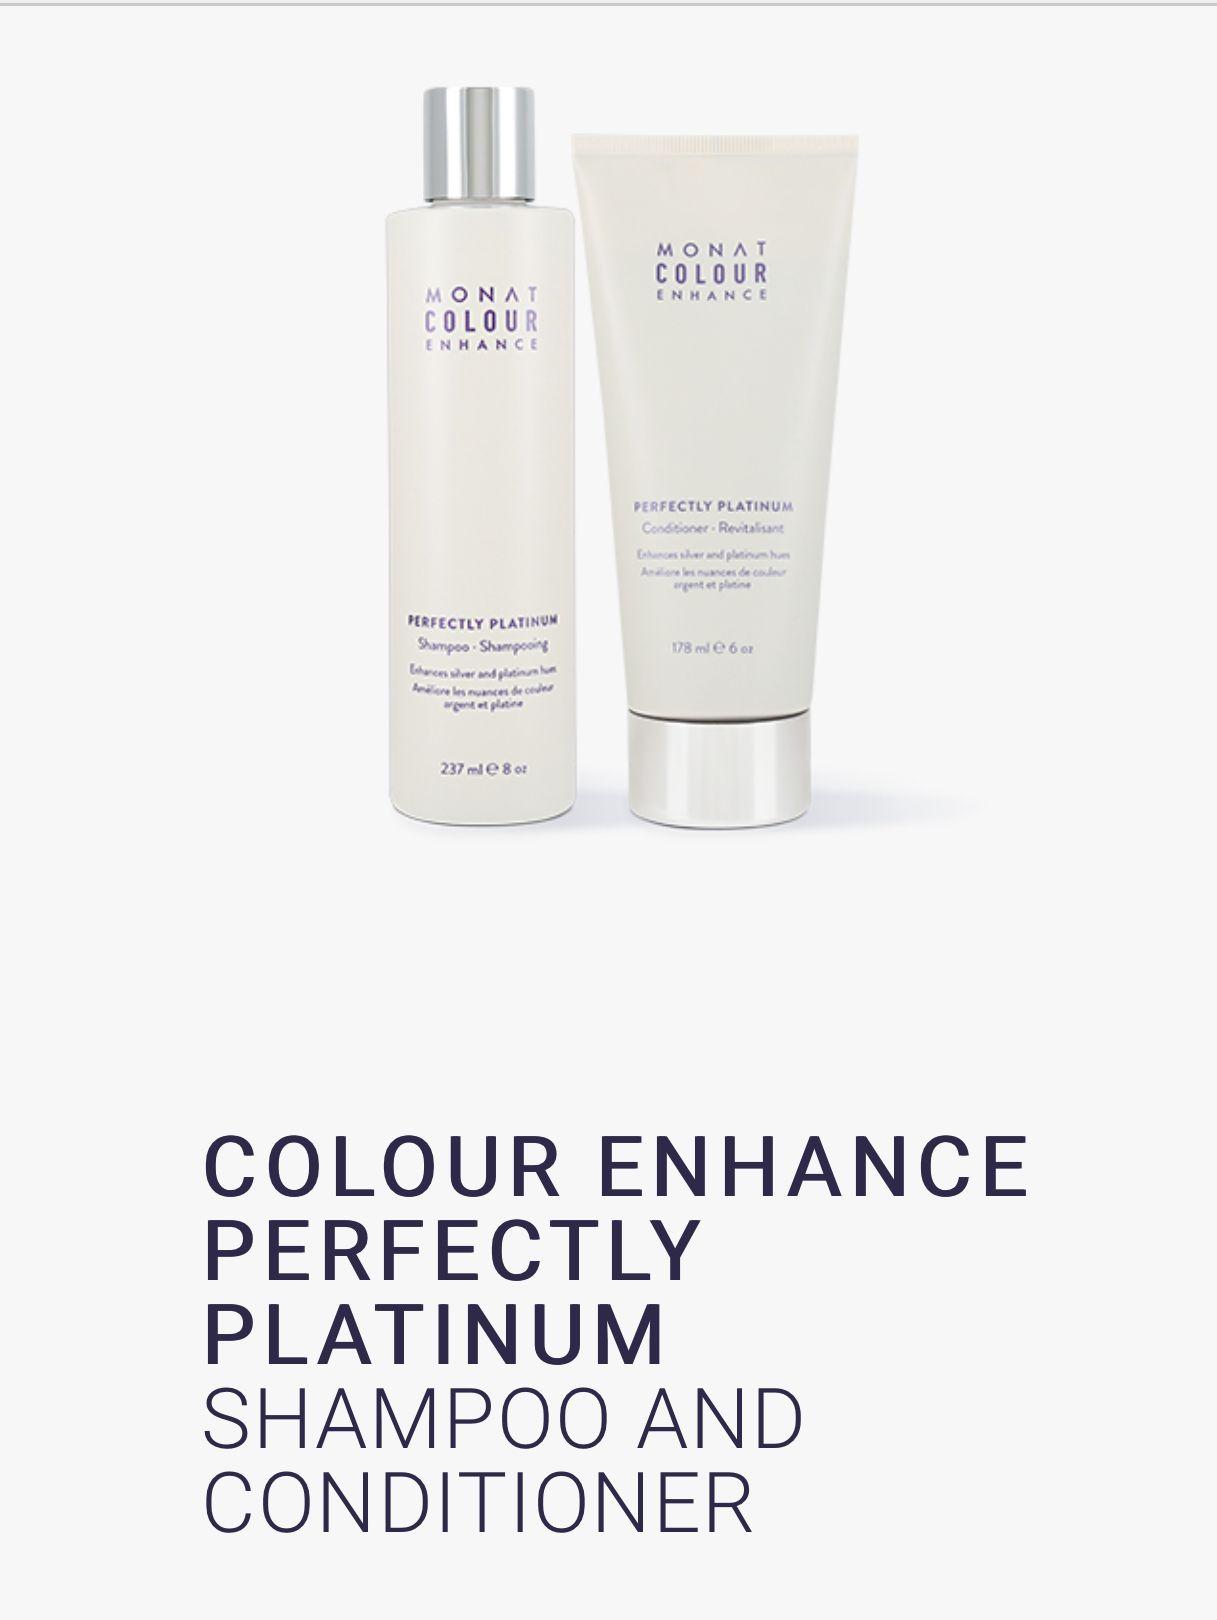 Colour Enhance Perfectly Platinum